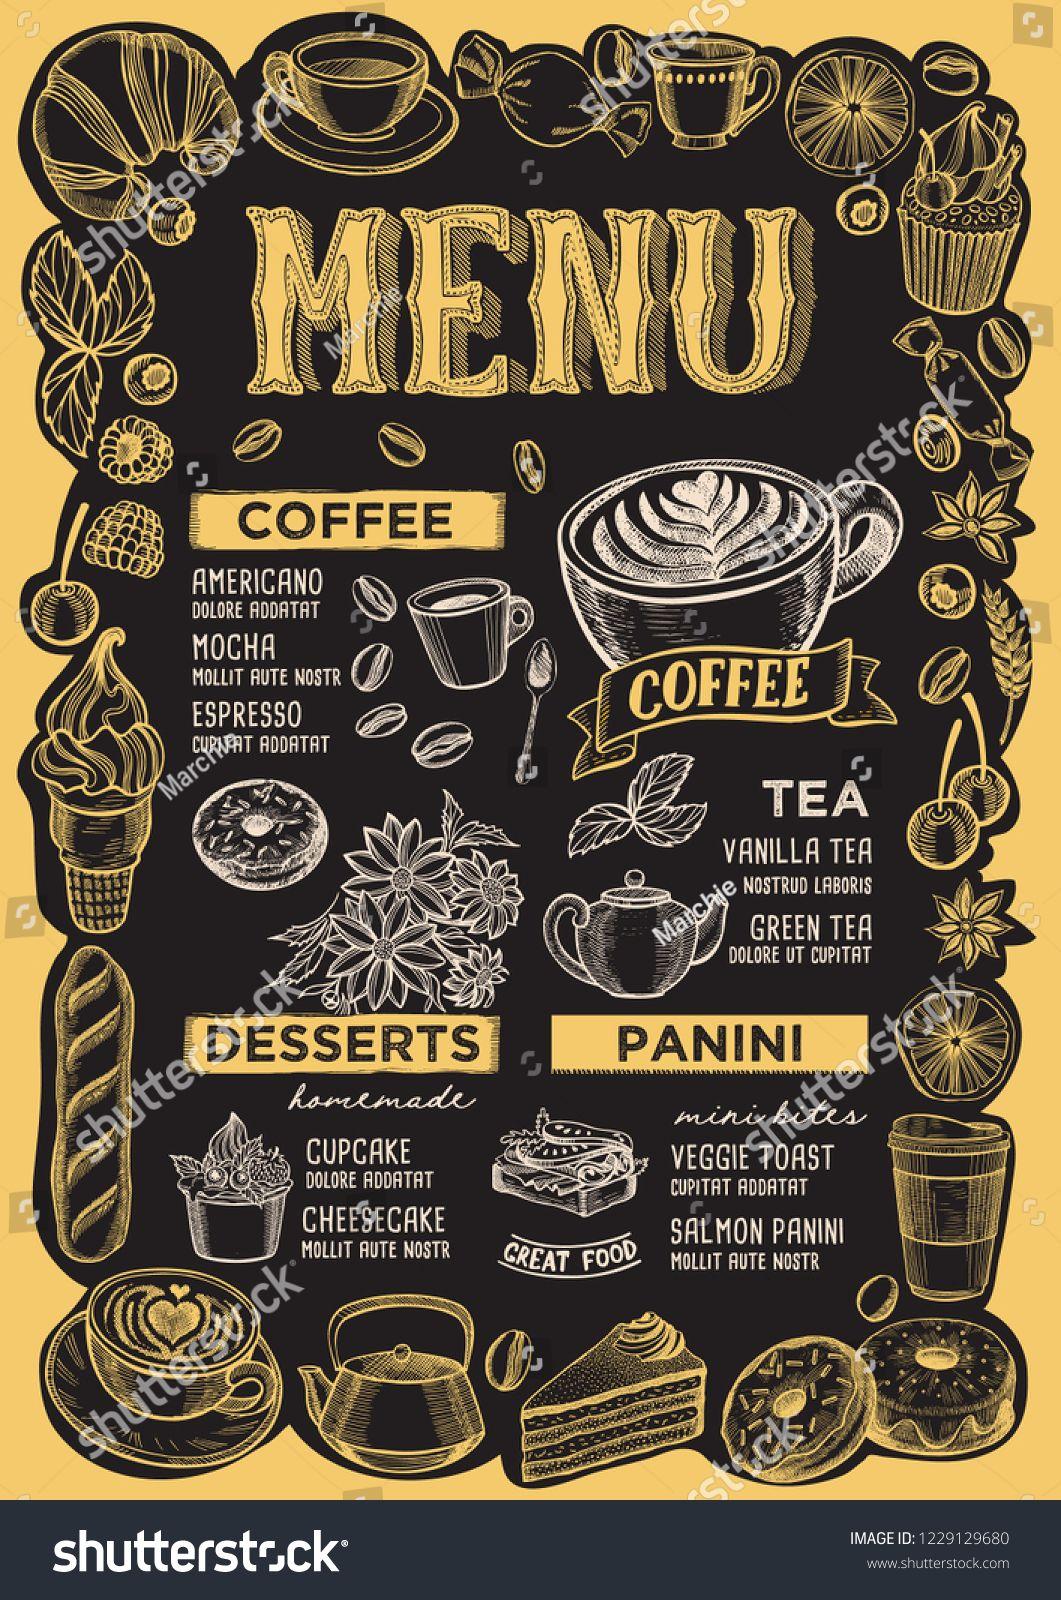 Coffee Menu Template For Restaurant On A Blackboard Background Vector Illustration Brochure For Food And Drink Cafe In 2020 Bakery Menu Menu Template Food Menu Design